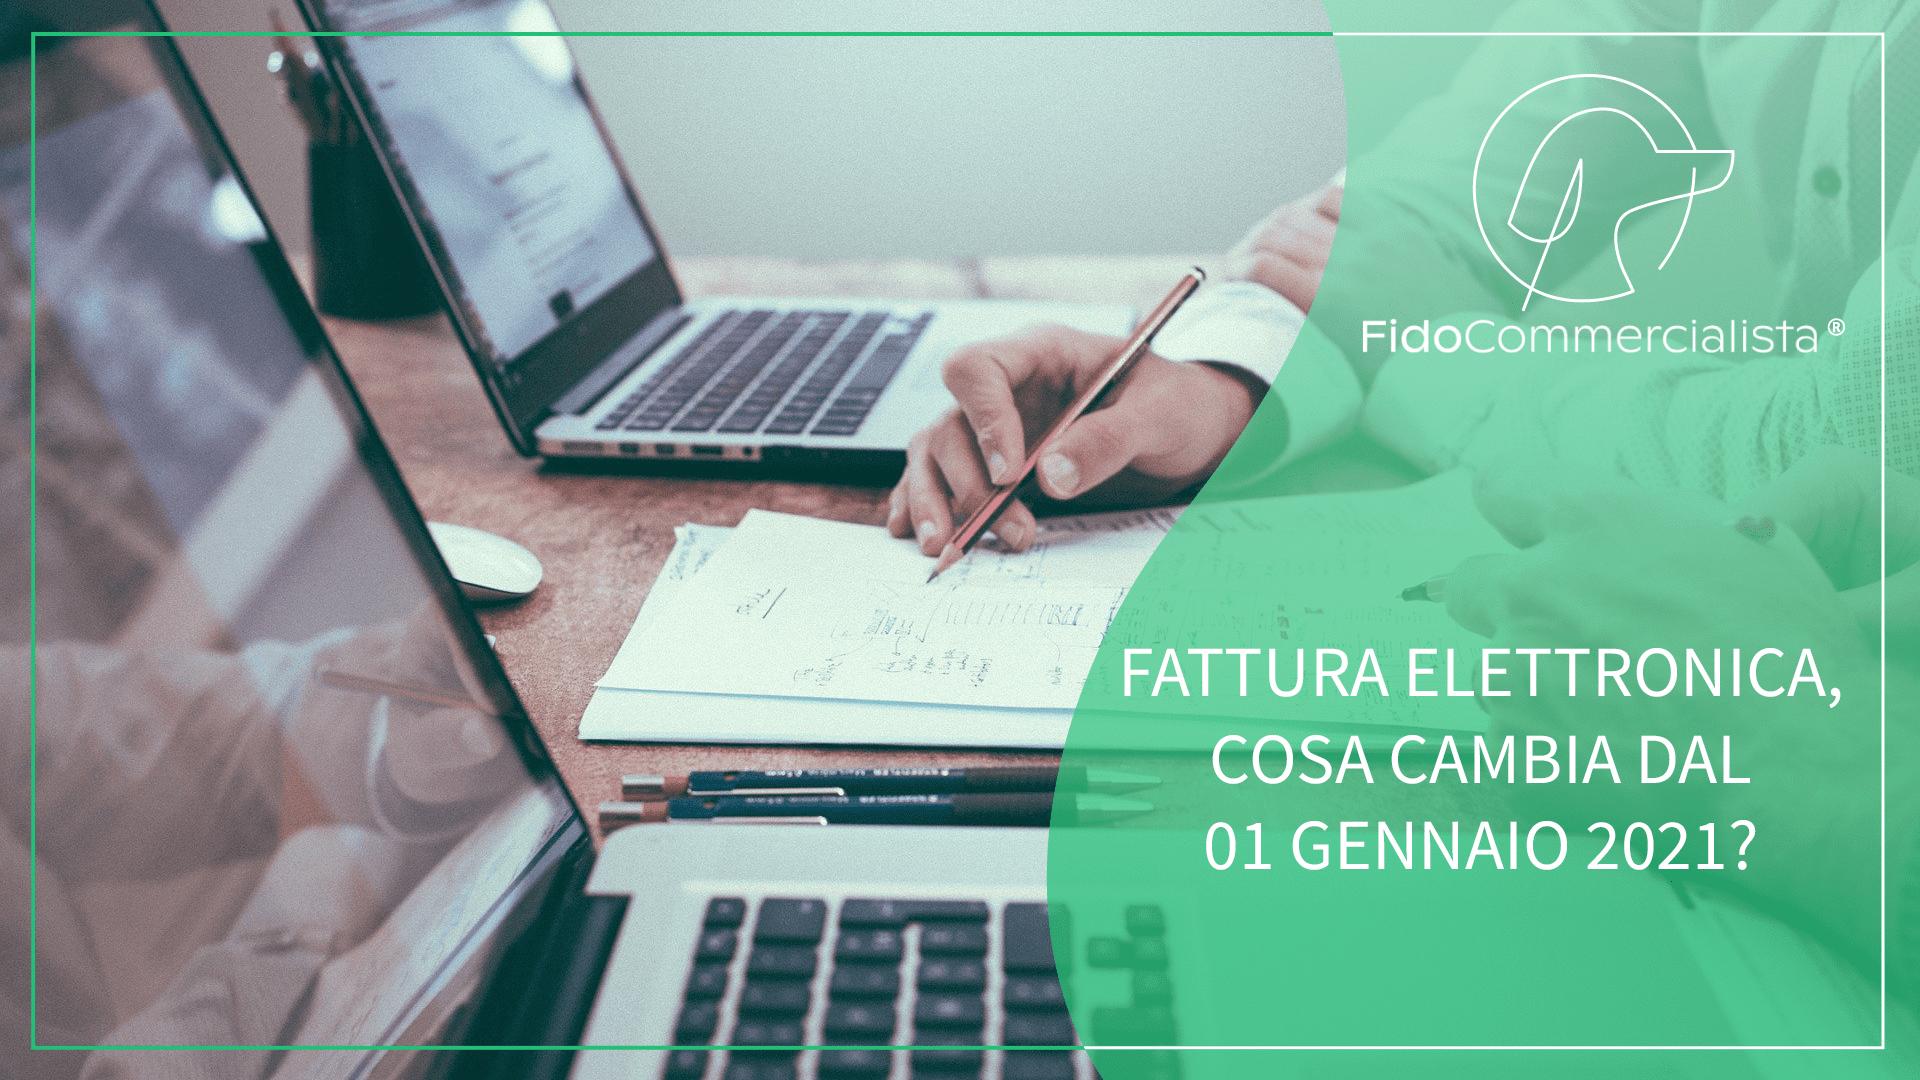 FATTURA ELETTRONICA BIS 1